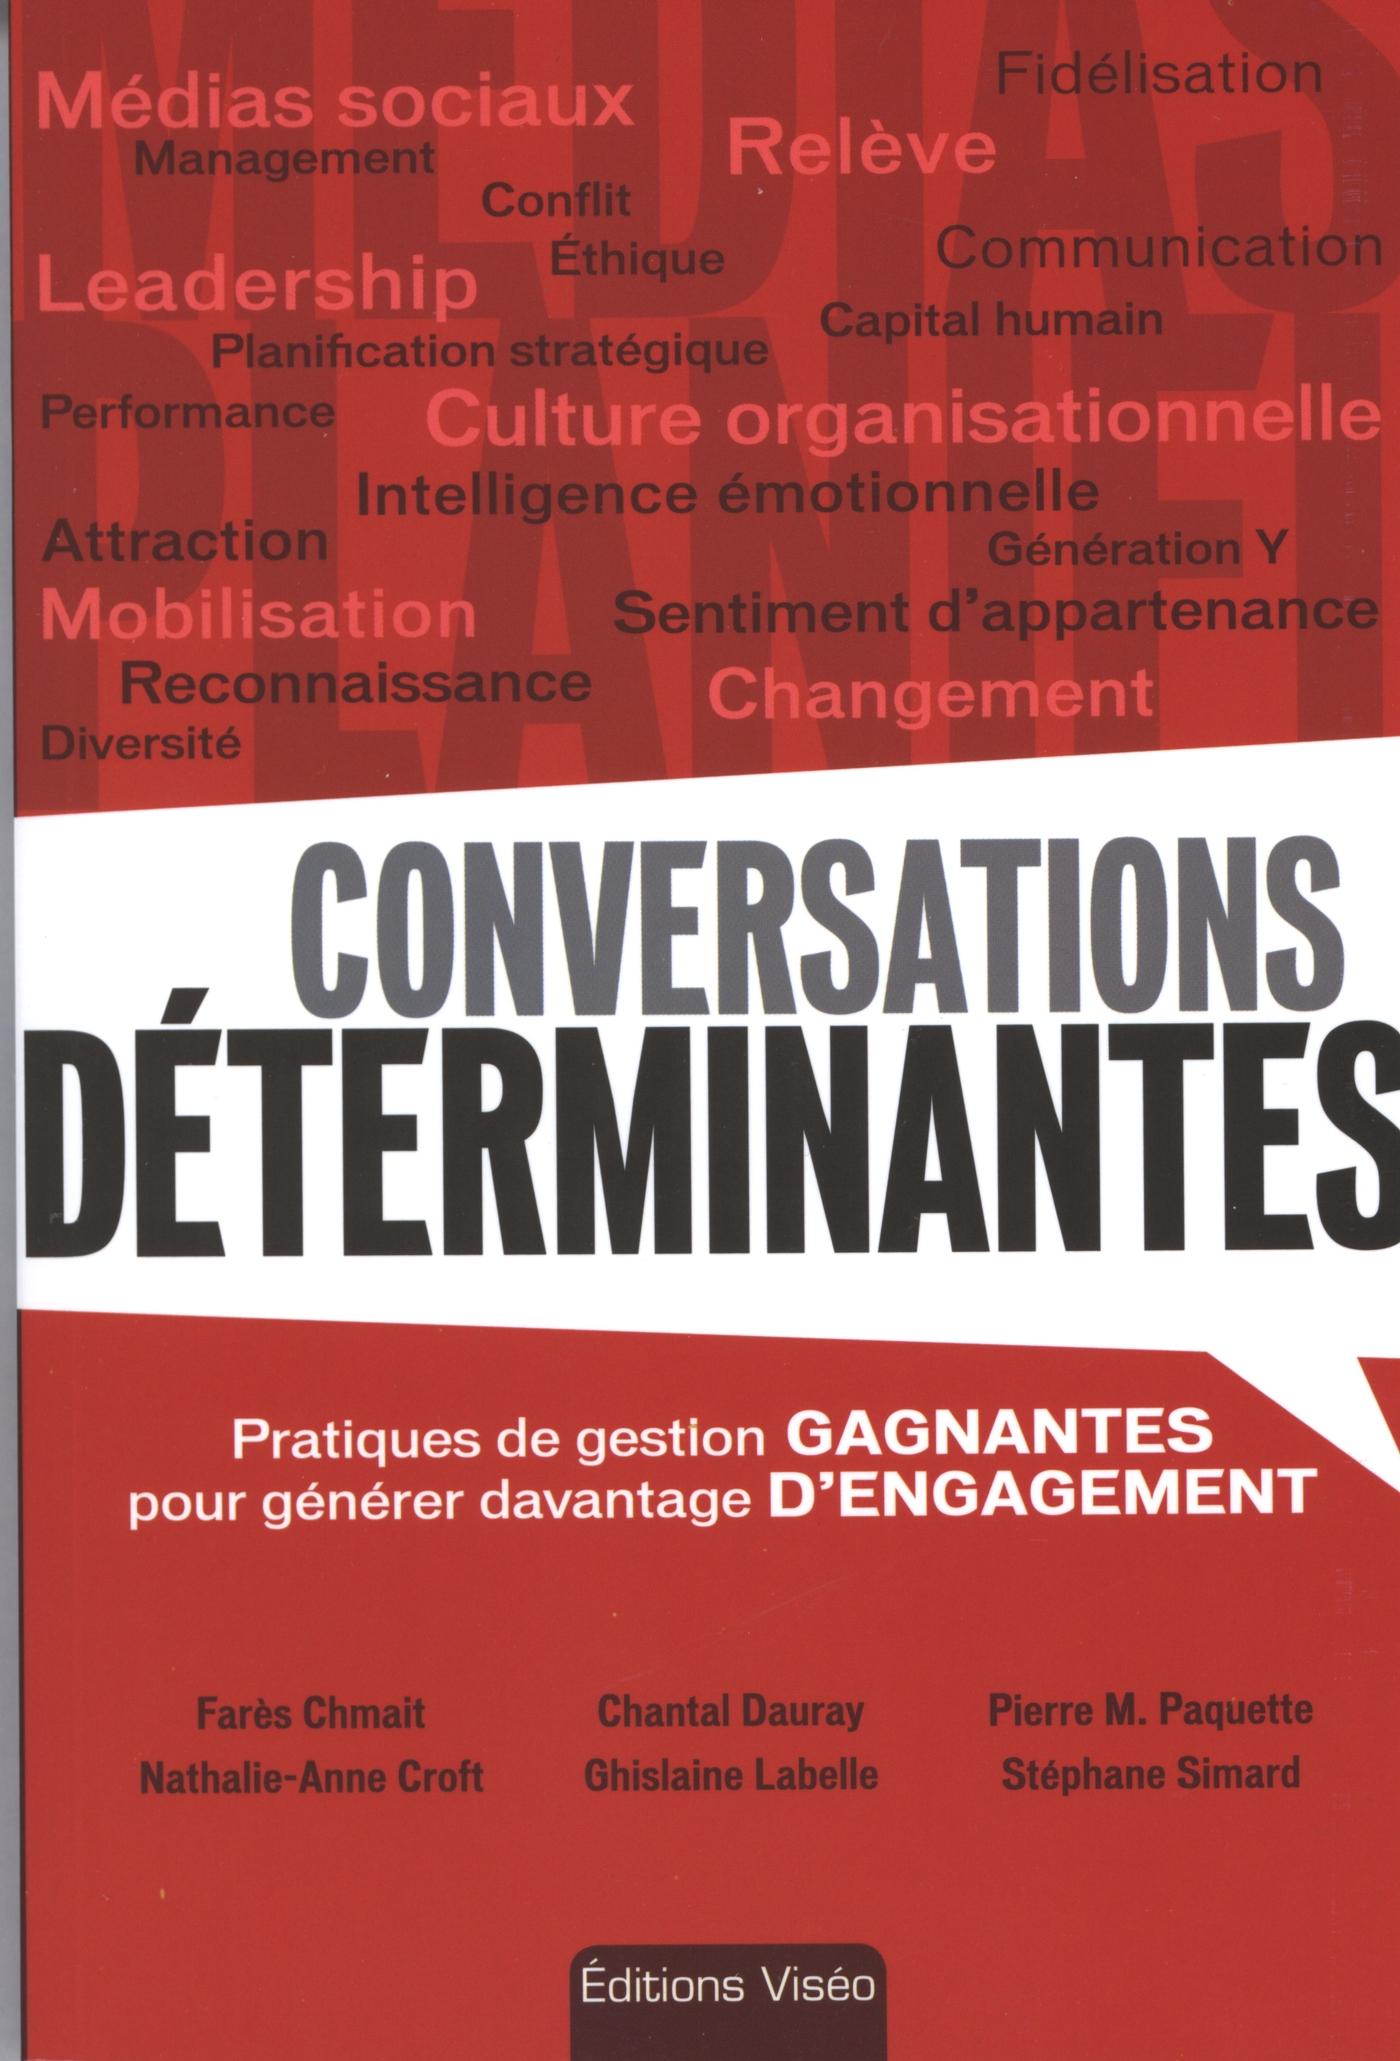 CONVERSATIONS DETERMINANTES